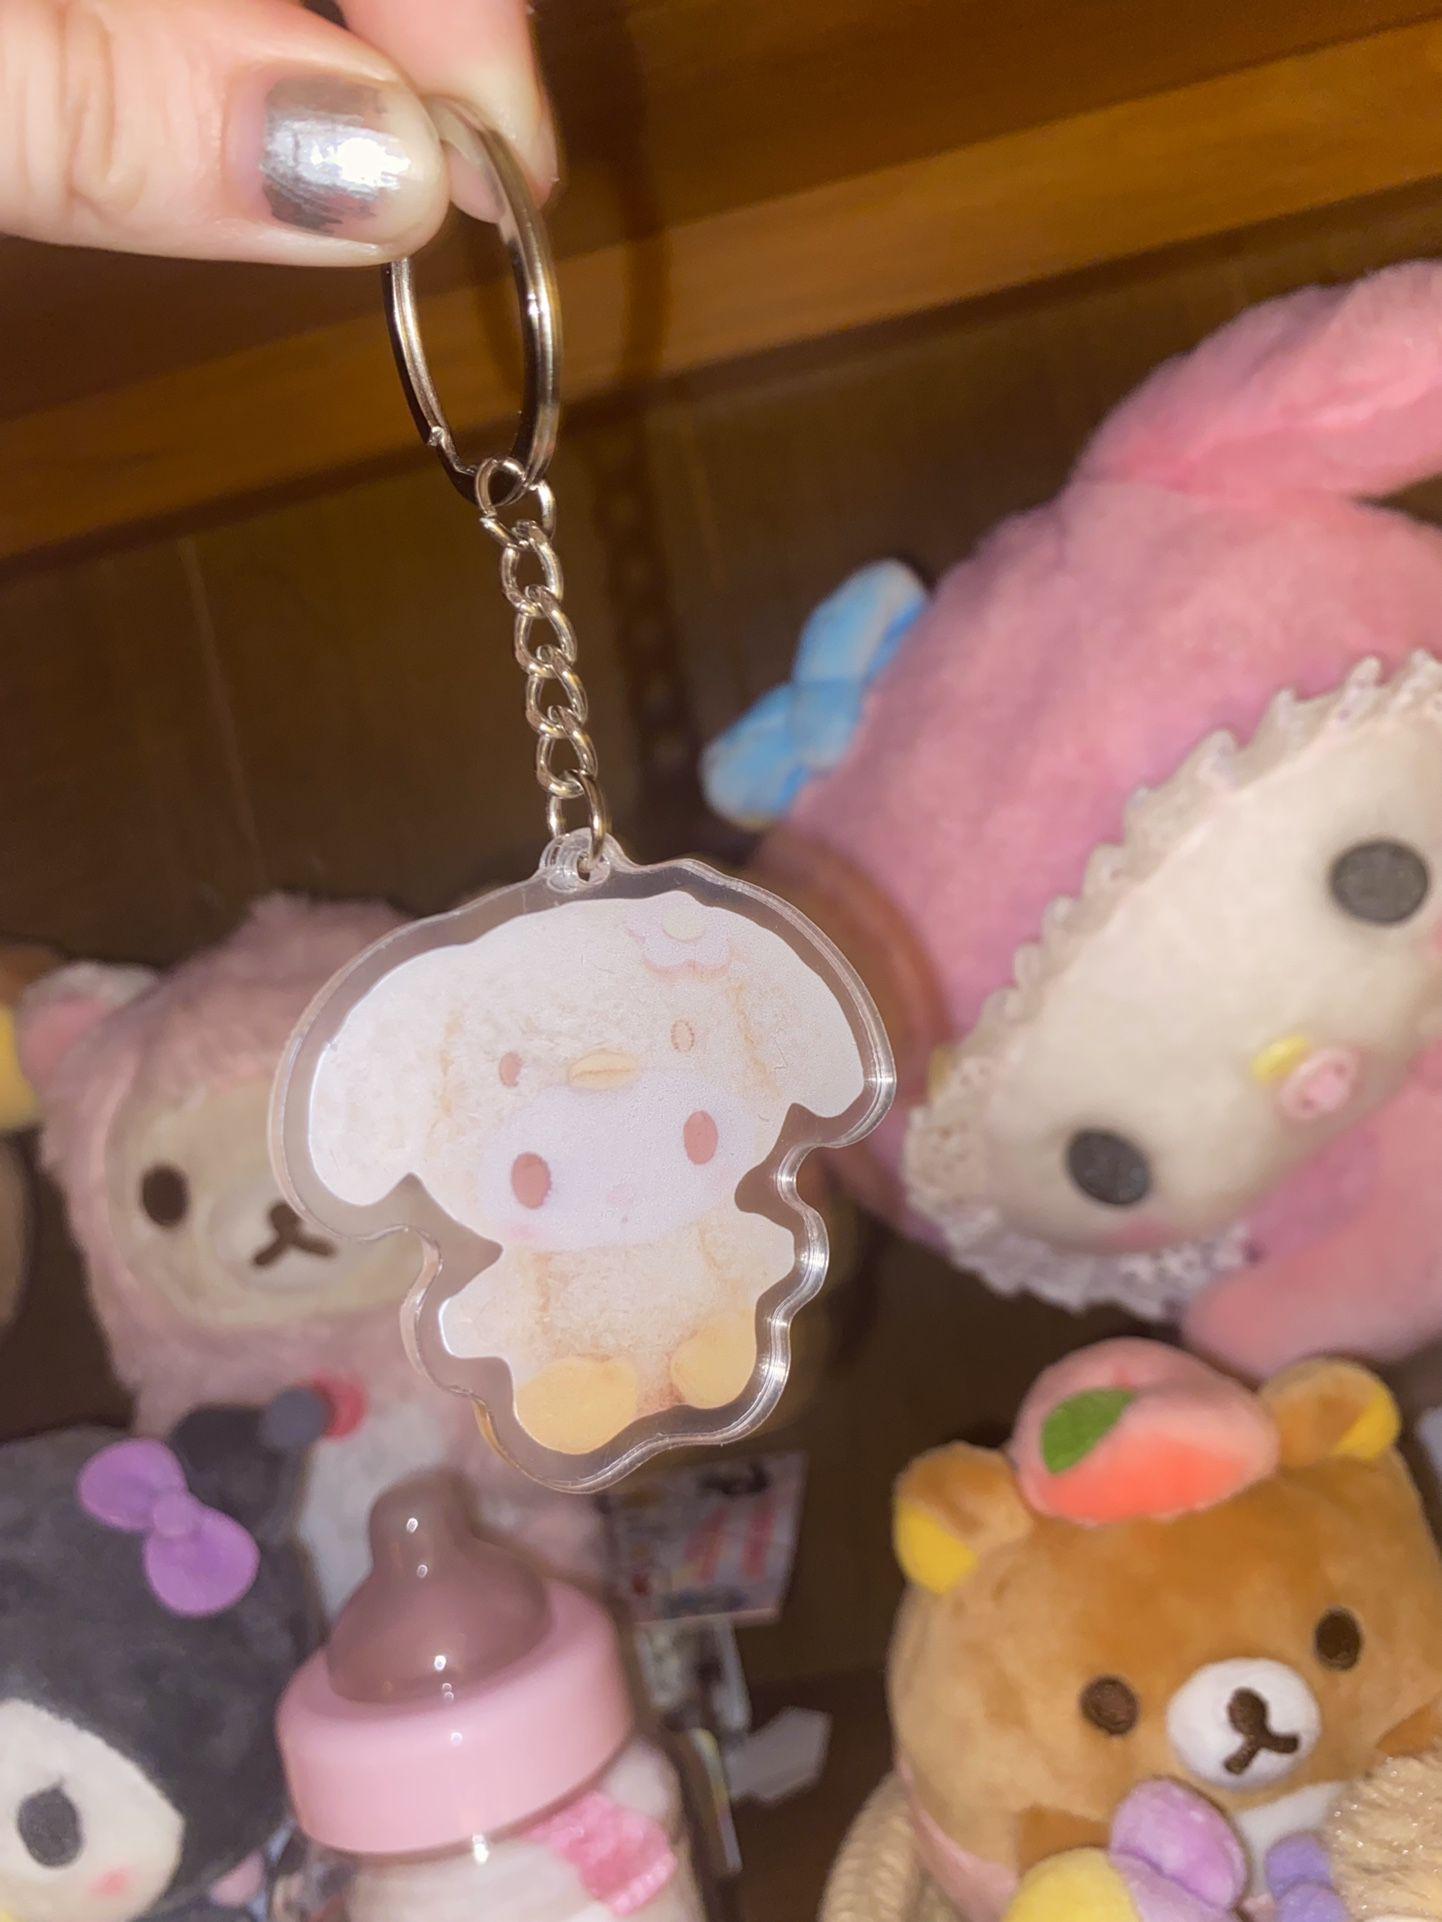 Sanrio My Melody Keychain!